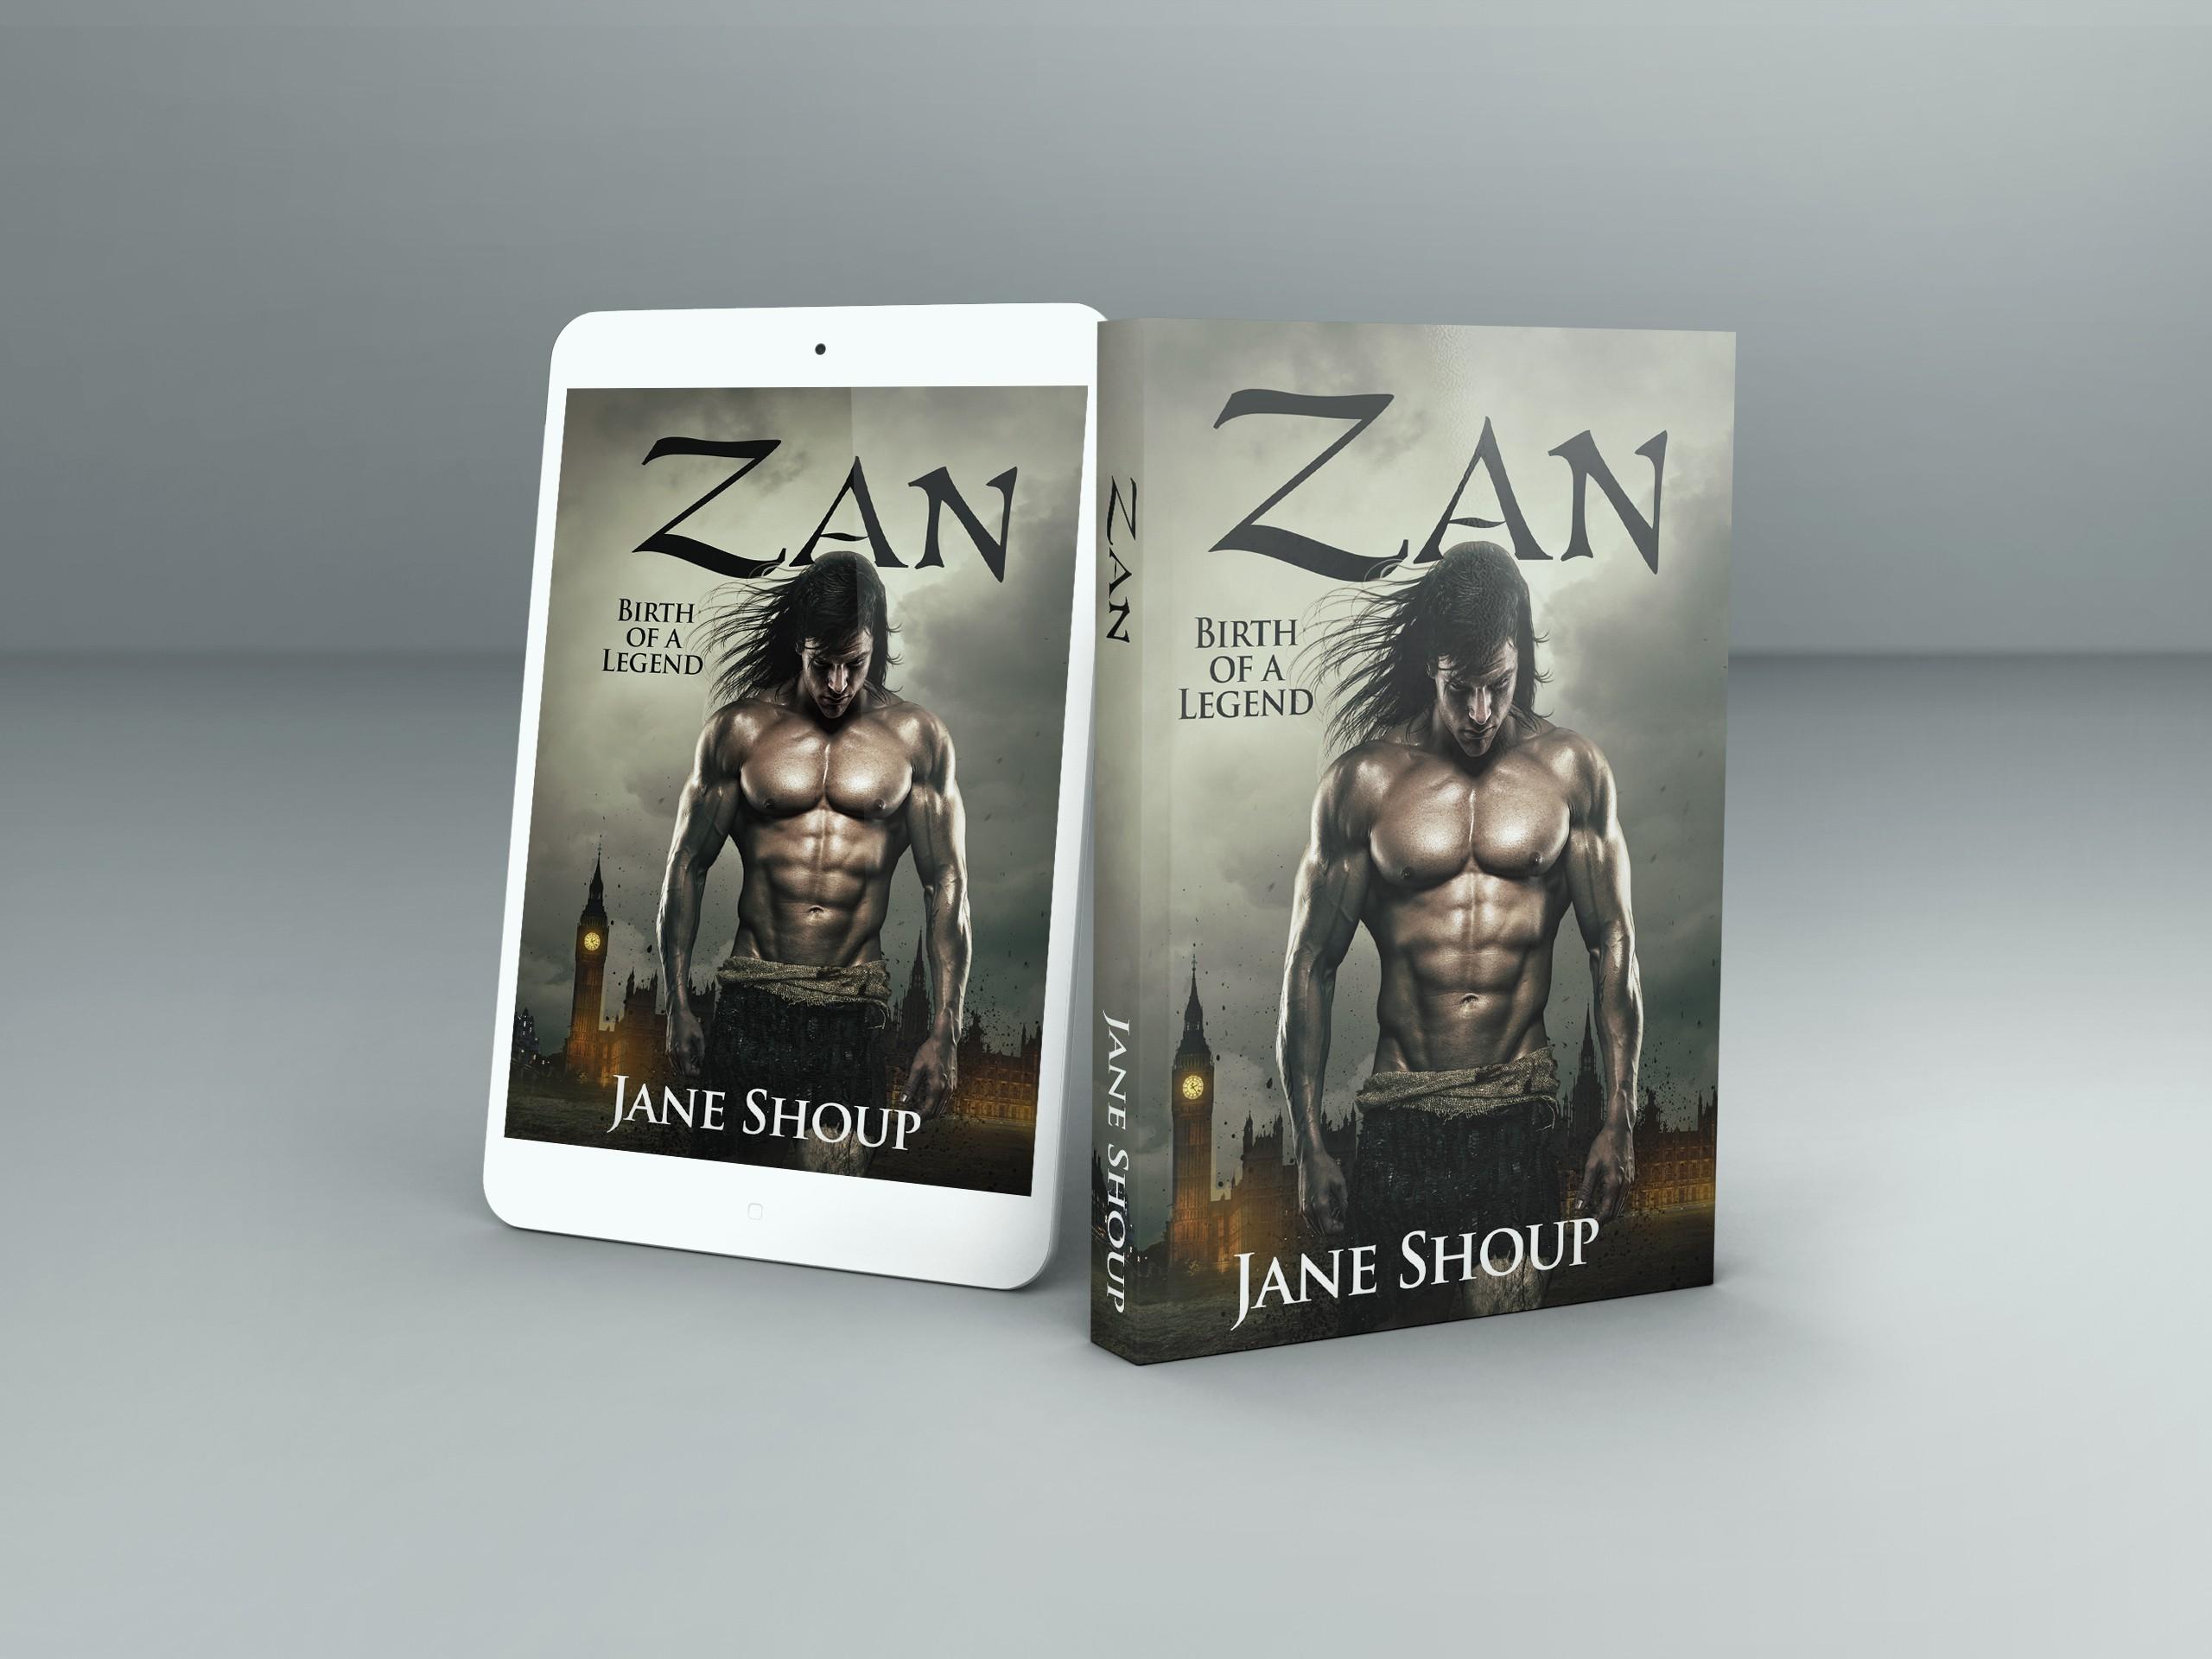 Book cover for Zan, the true story of Tarzan ...